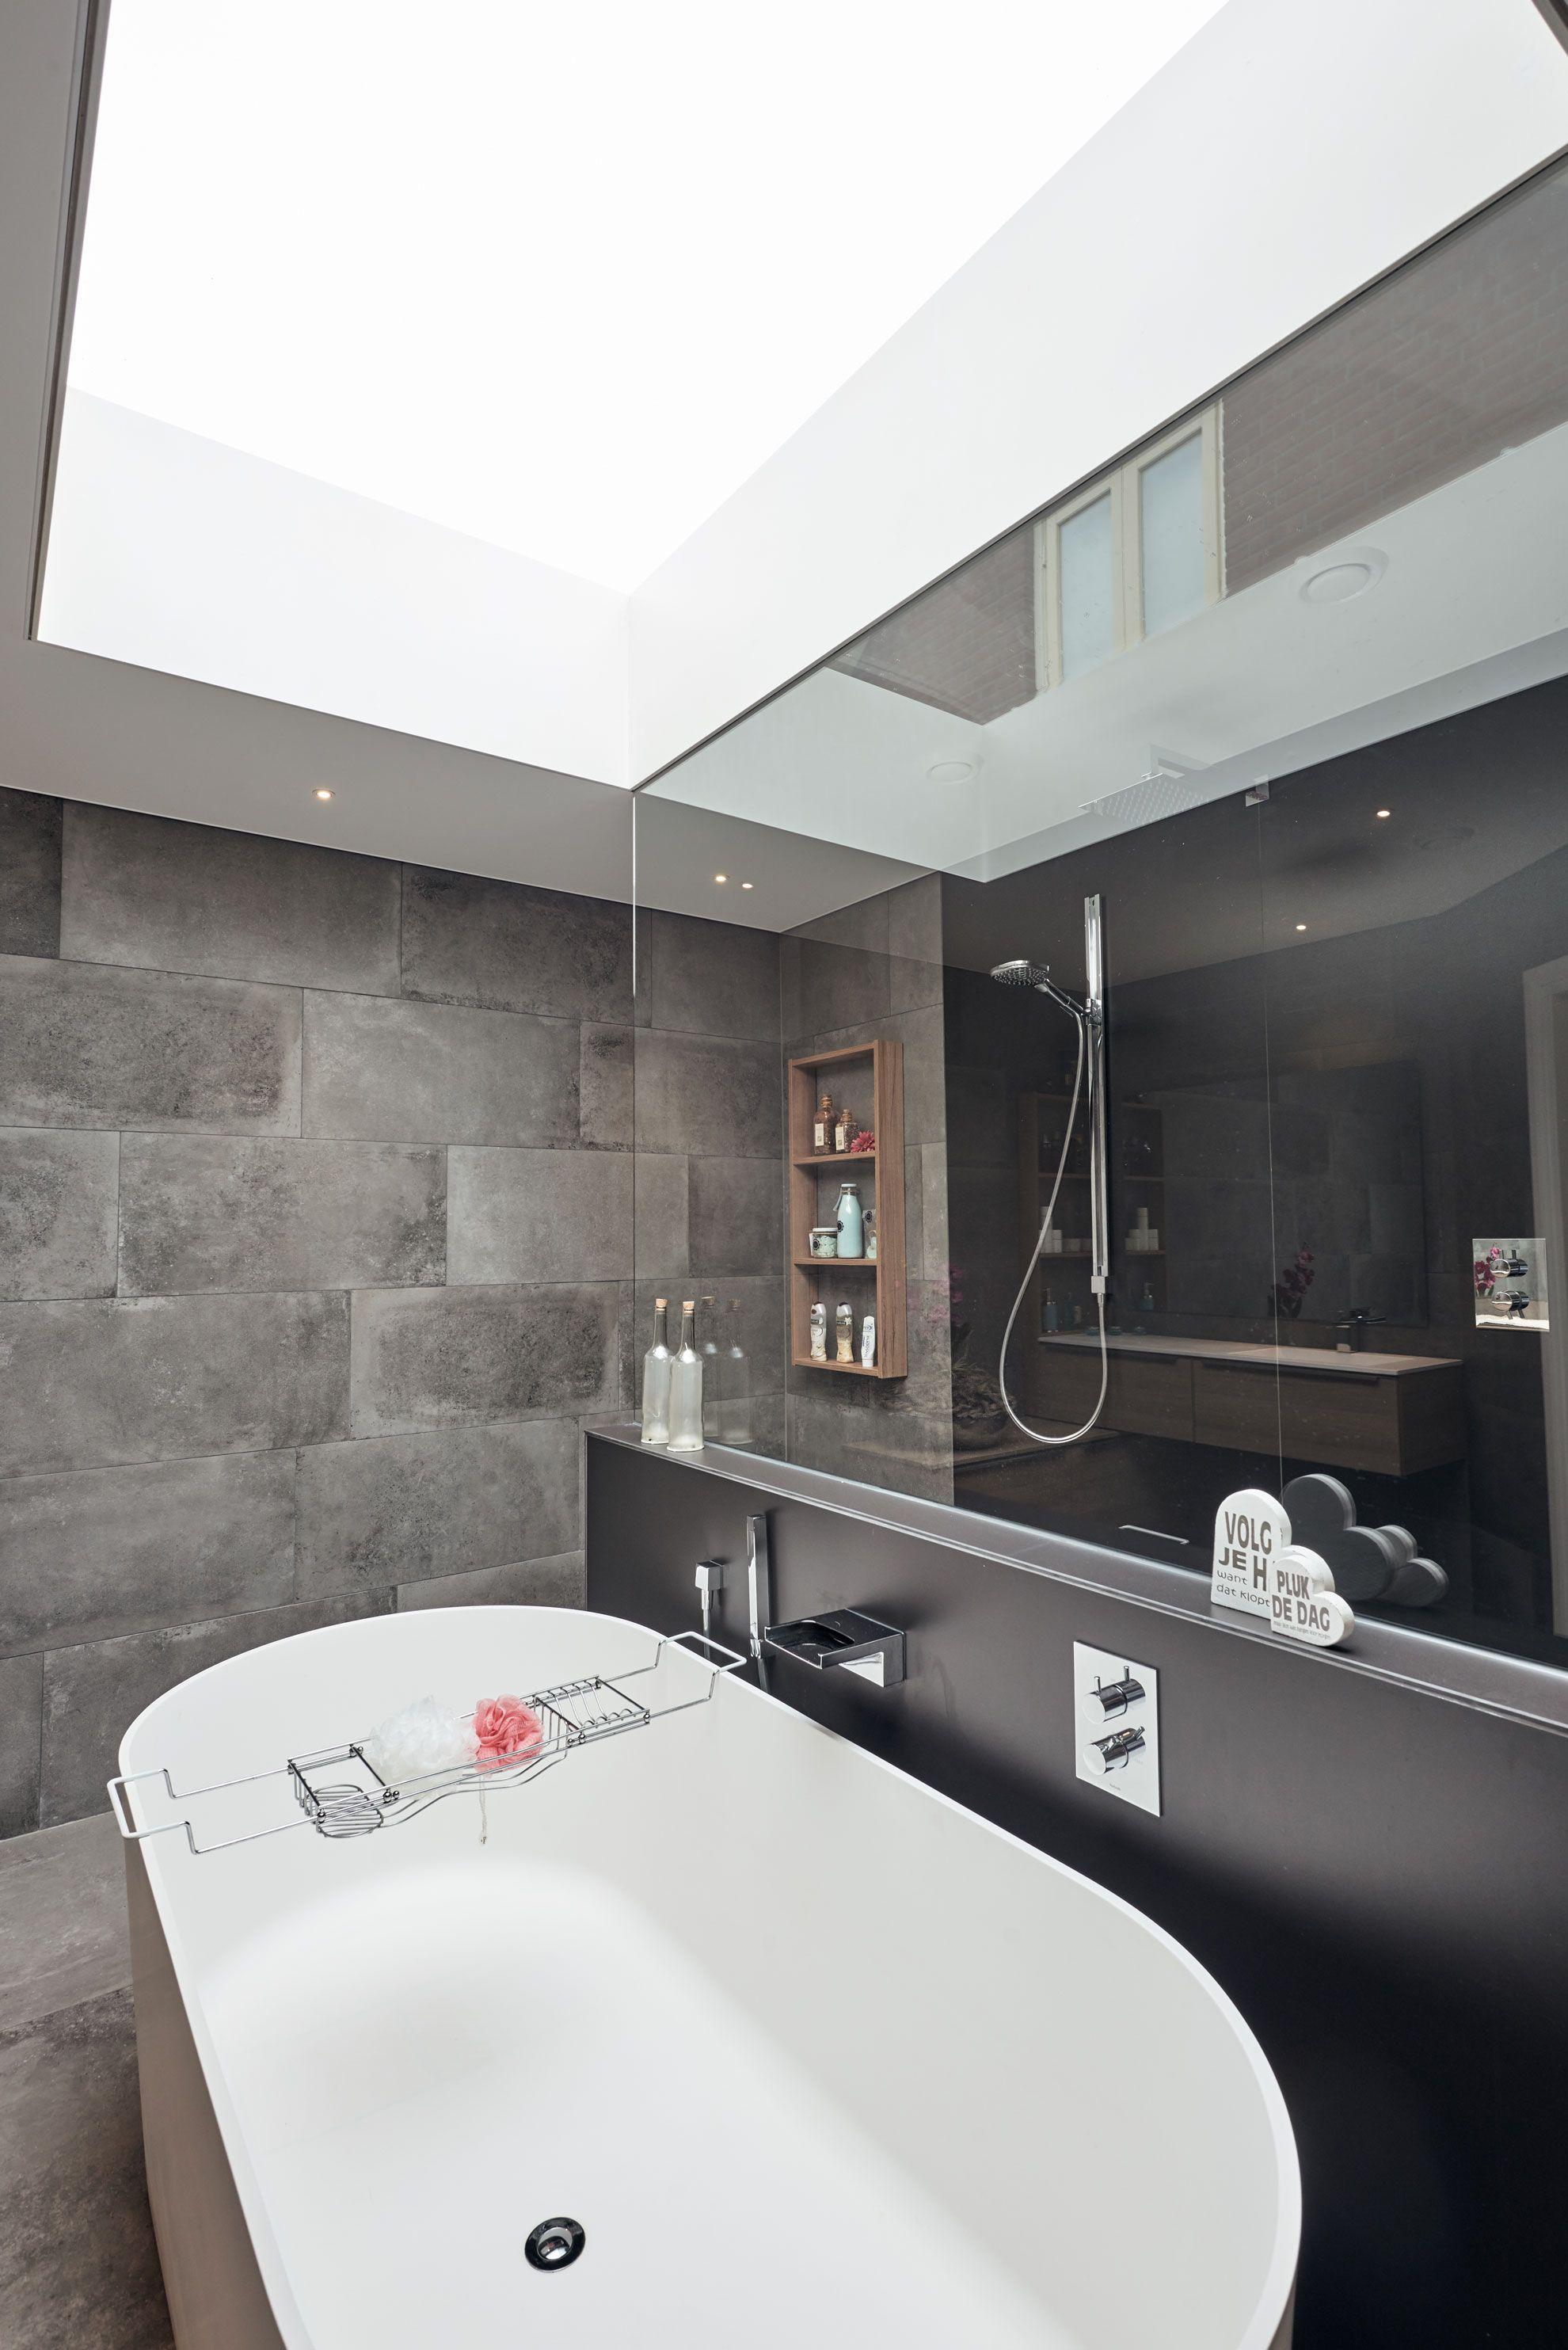 Badezimmer Decke Beleuchtung Badezimmer Badezimmer Decken Zimmer